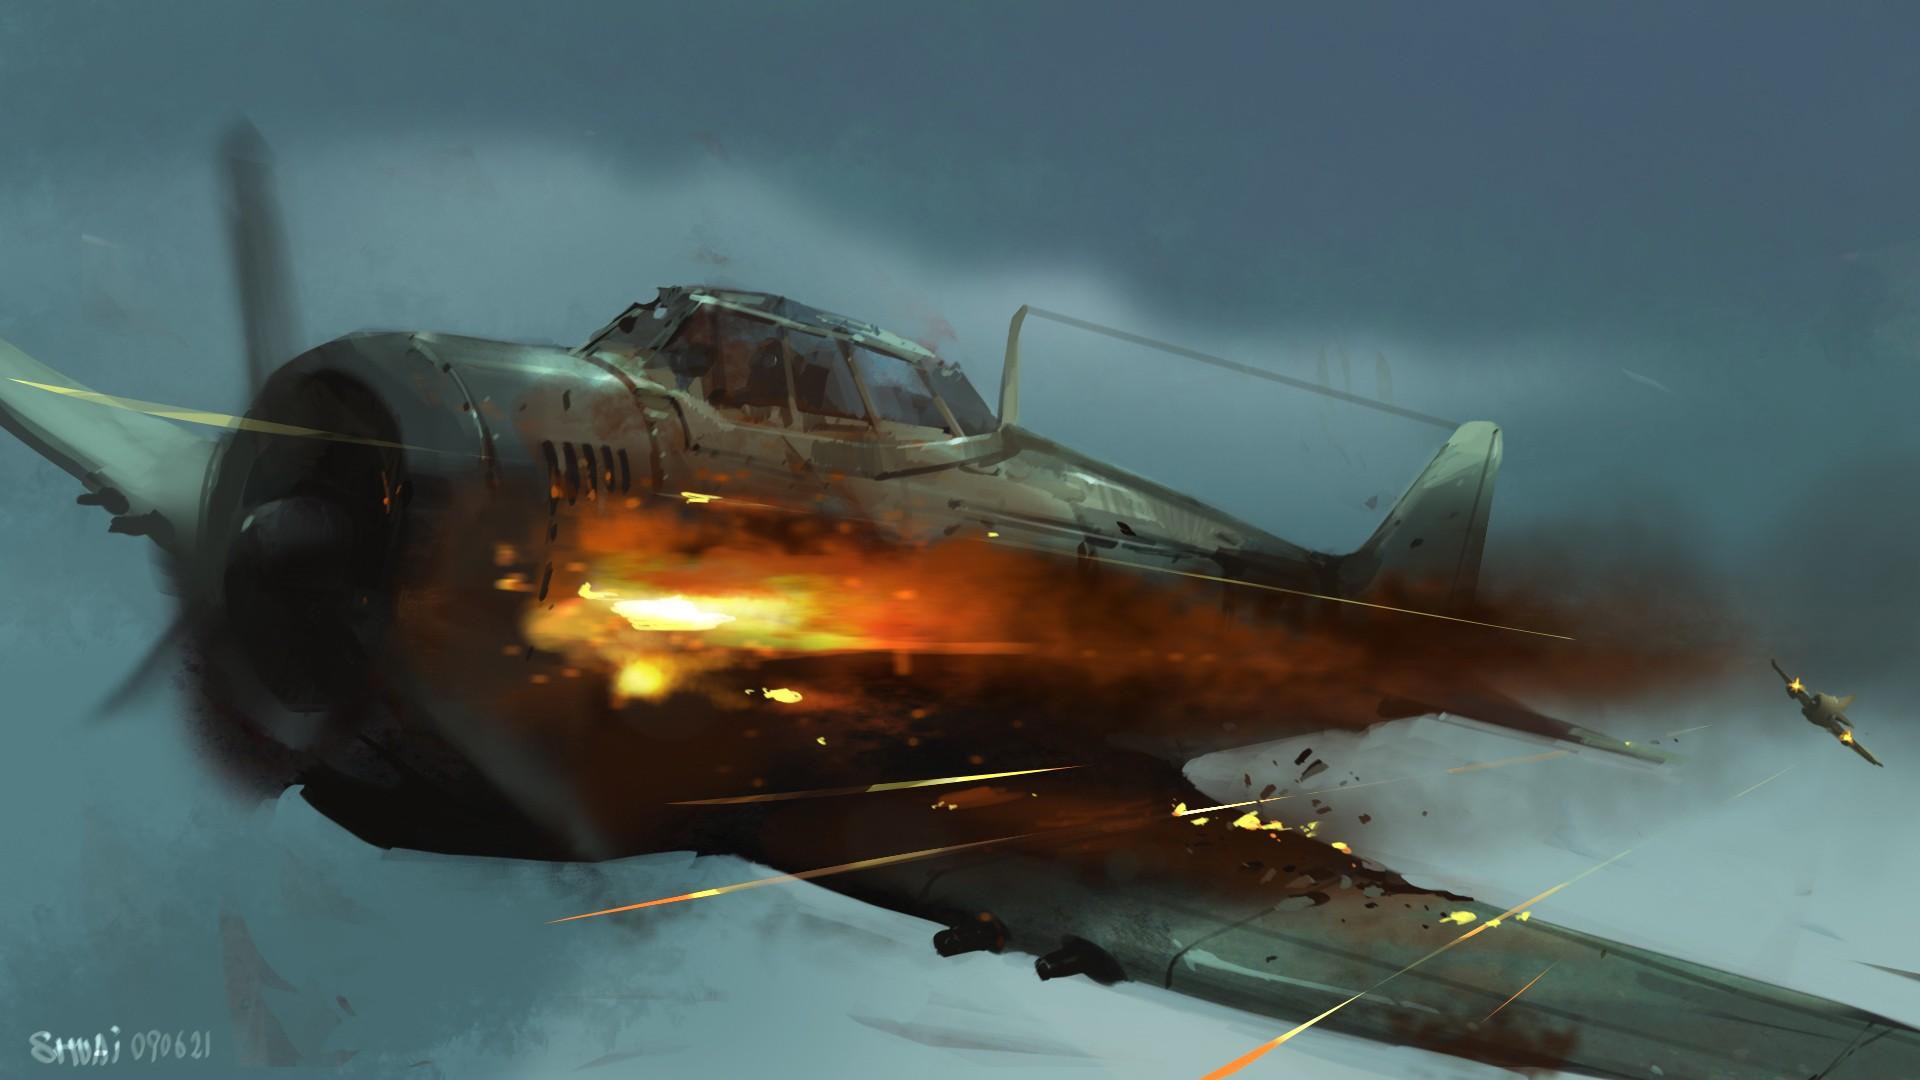 Drawn aircraft ww2 airplane Military Airplane military 1920x1080 WallpaperUP